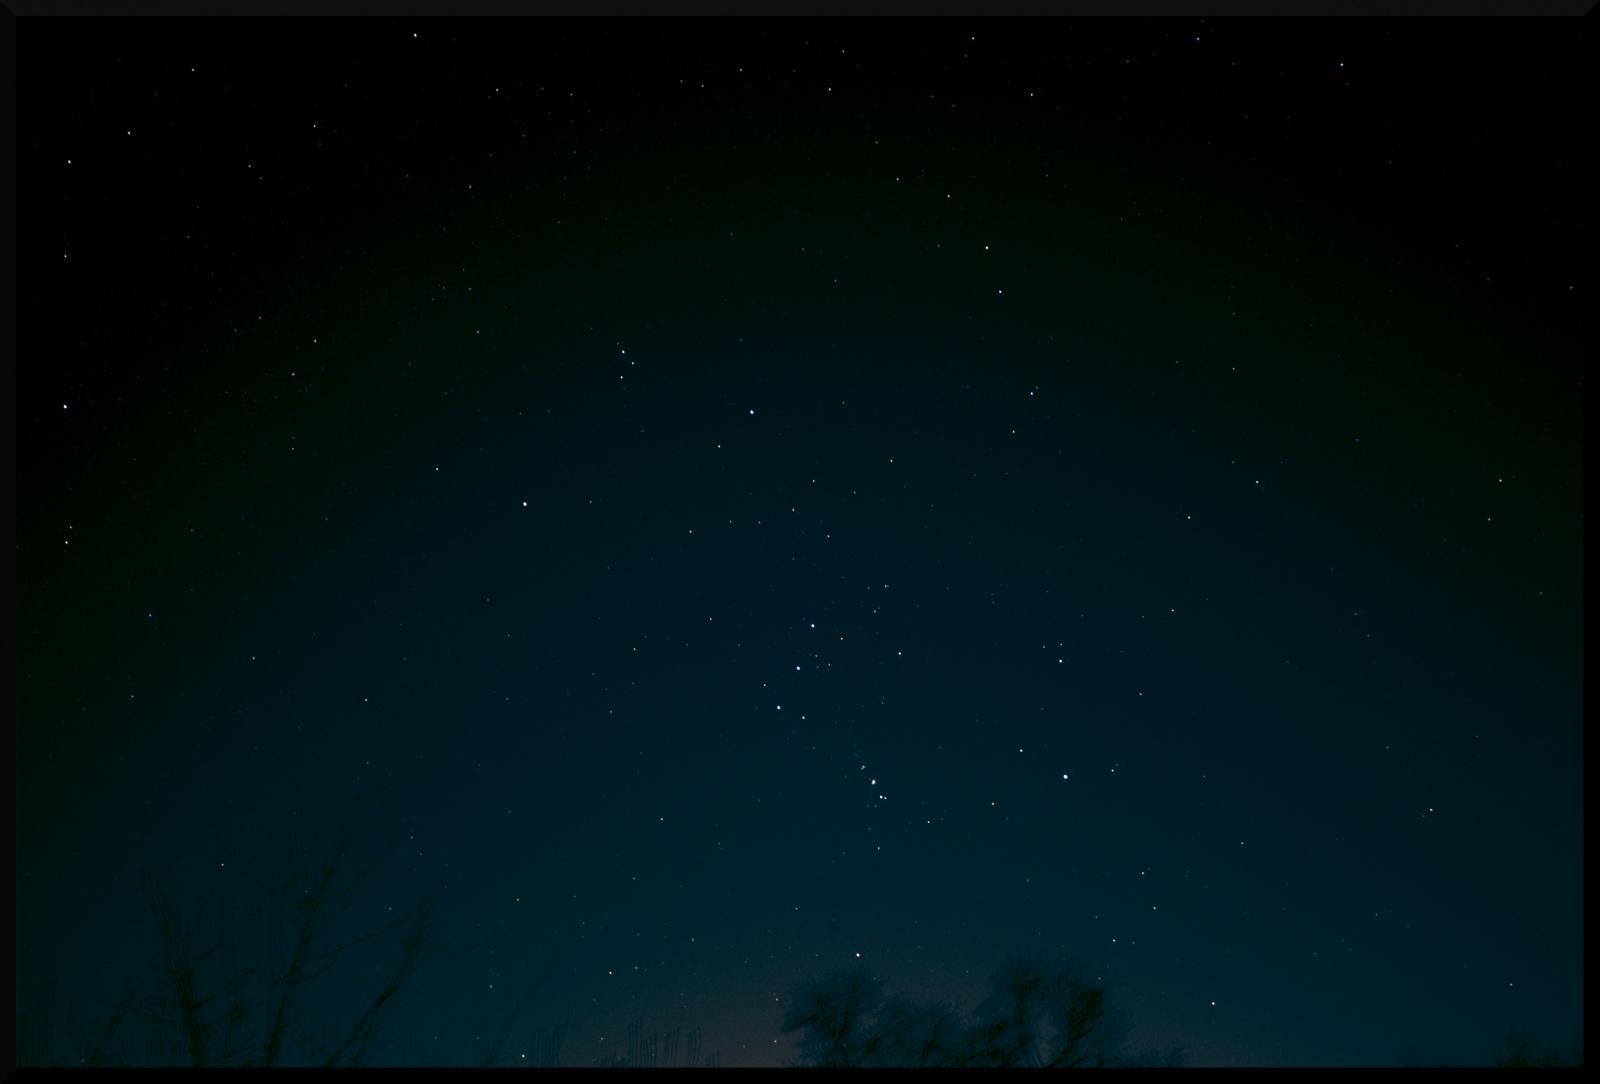 Orion20201116_g_fr.thumb.jpg.328a38b159f4f01b2bb7a9927069dd32.jpg